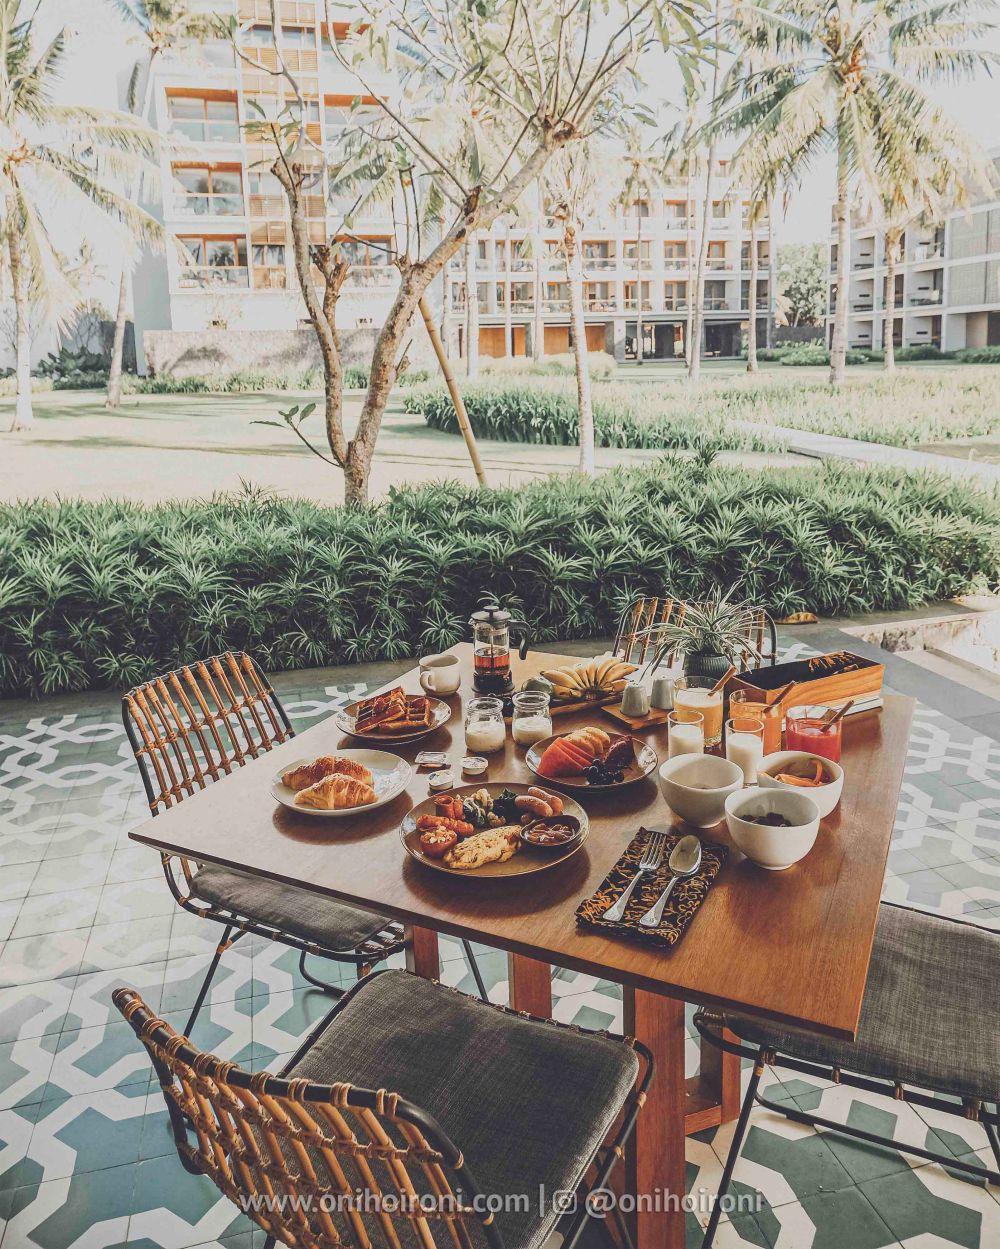 3 Breakfast Casabanyu restaurant & bar Review Hotel Dialoog Banyuwangi oni hoironi